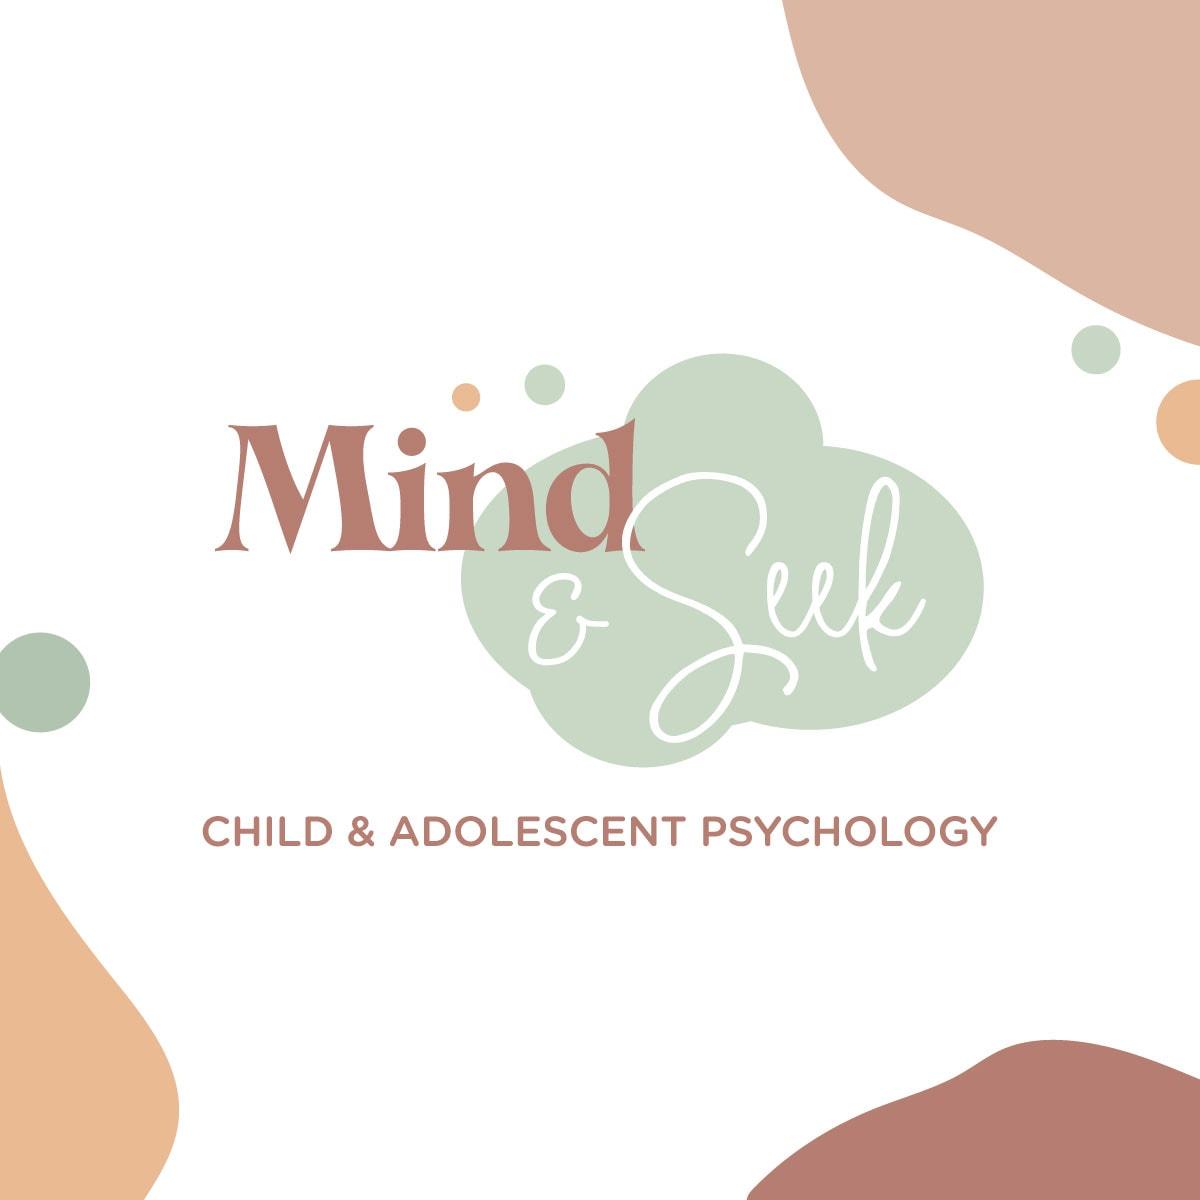 mind&seek promo2